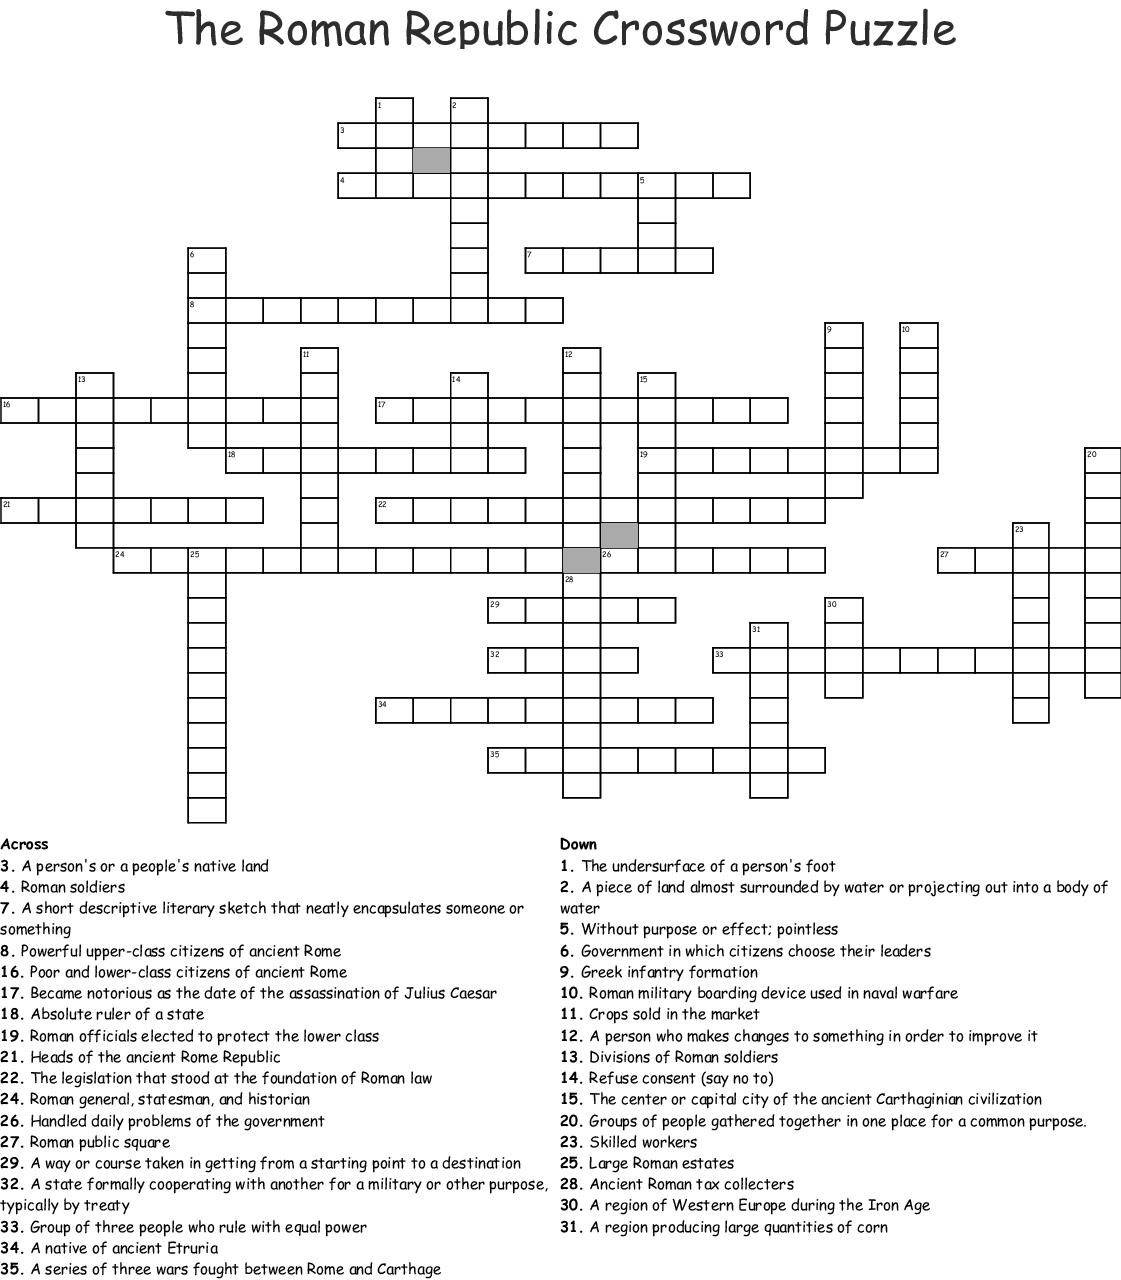 The Roman Republic Crossword